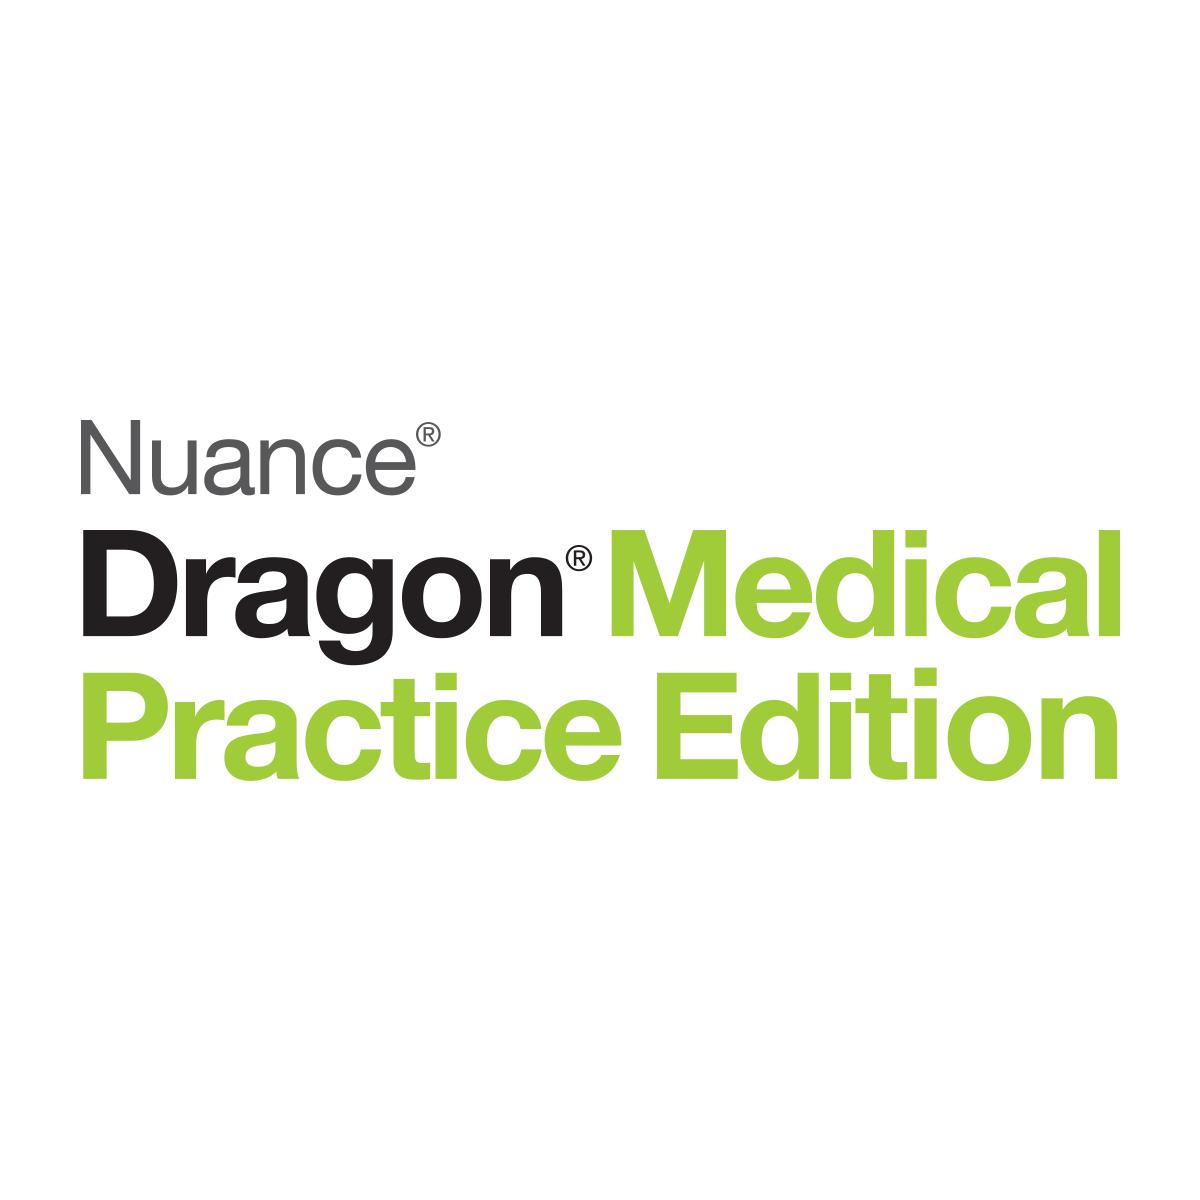 NUA-ESN-A709A-X00-4.0 DRAGON MEDICAL PRACTICE EDITION 4 **NON-PHYSICAL PRODUCT**